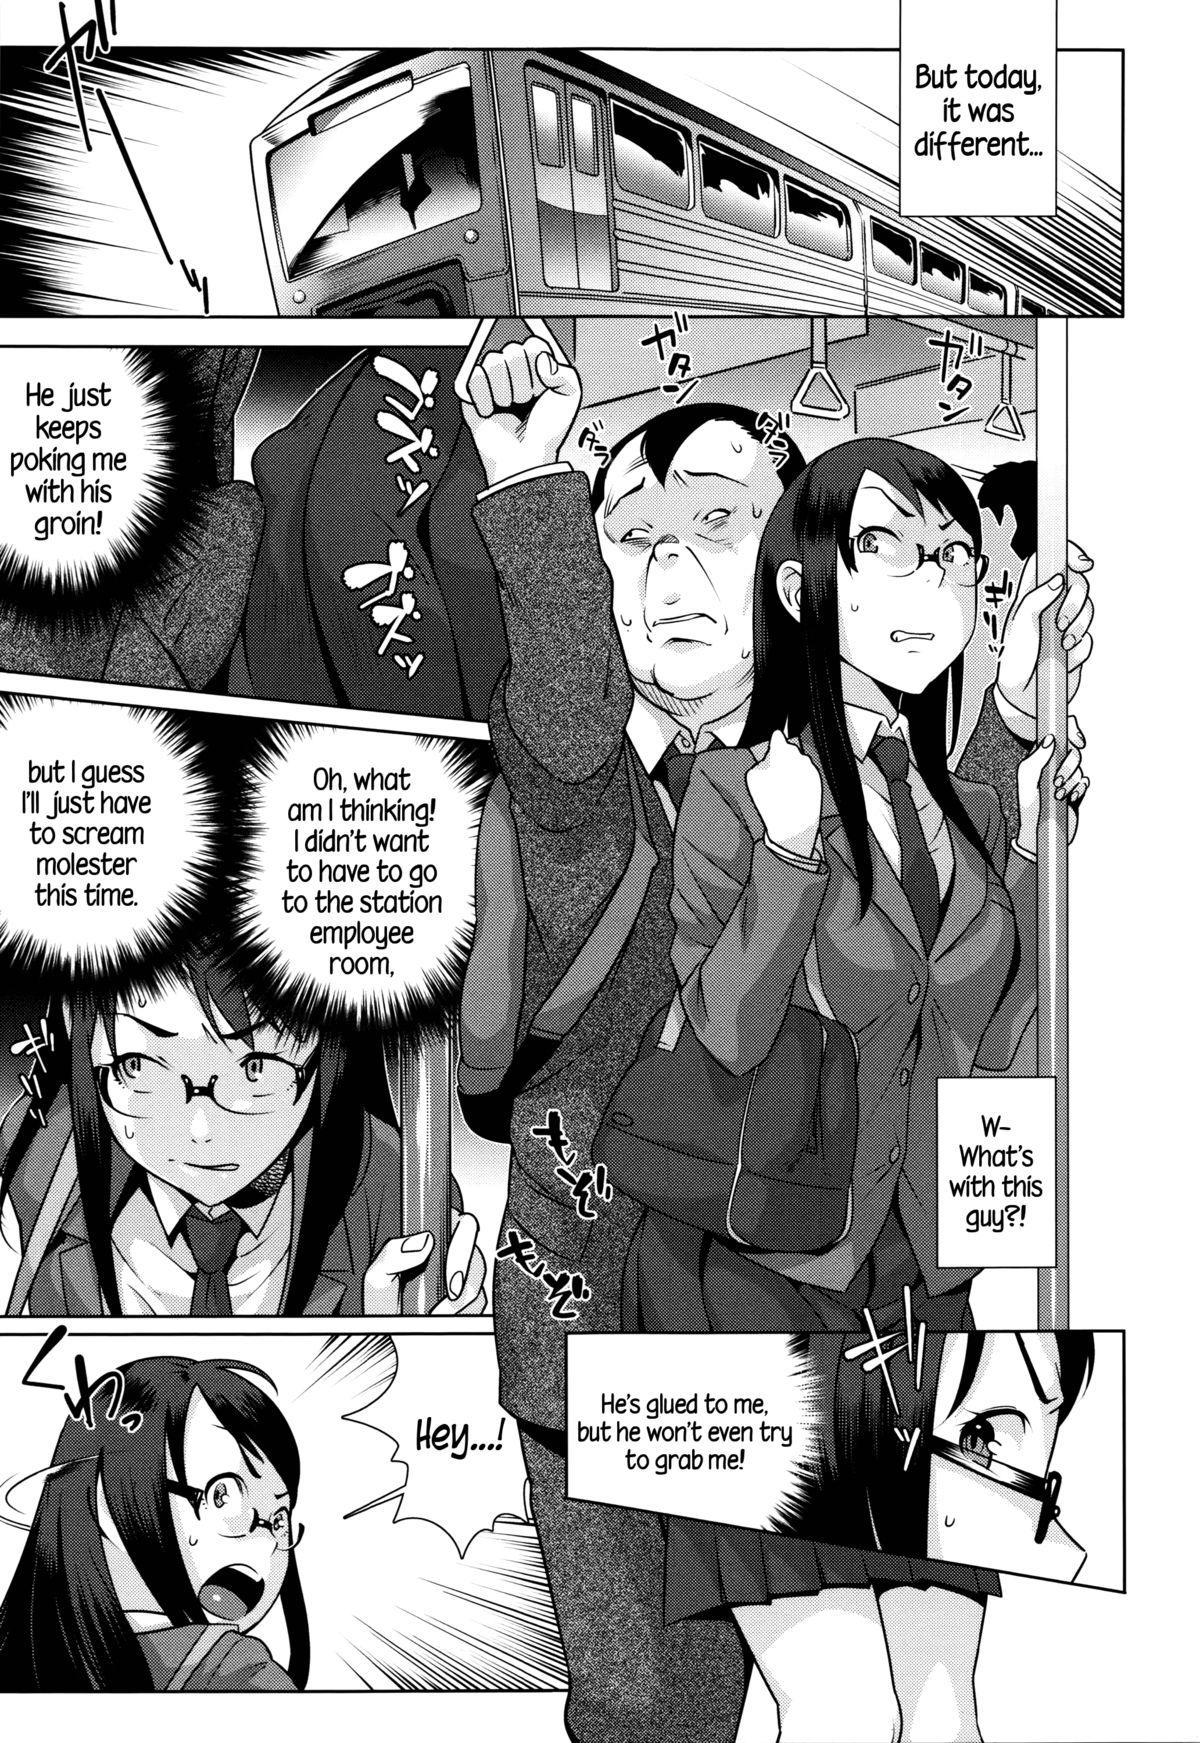 Hatsujou! Namaiki JK | Horny! Cheeky JK 11